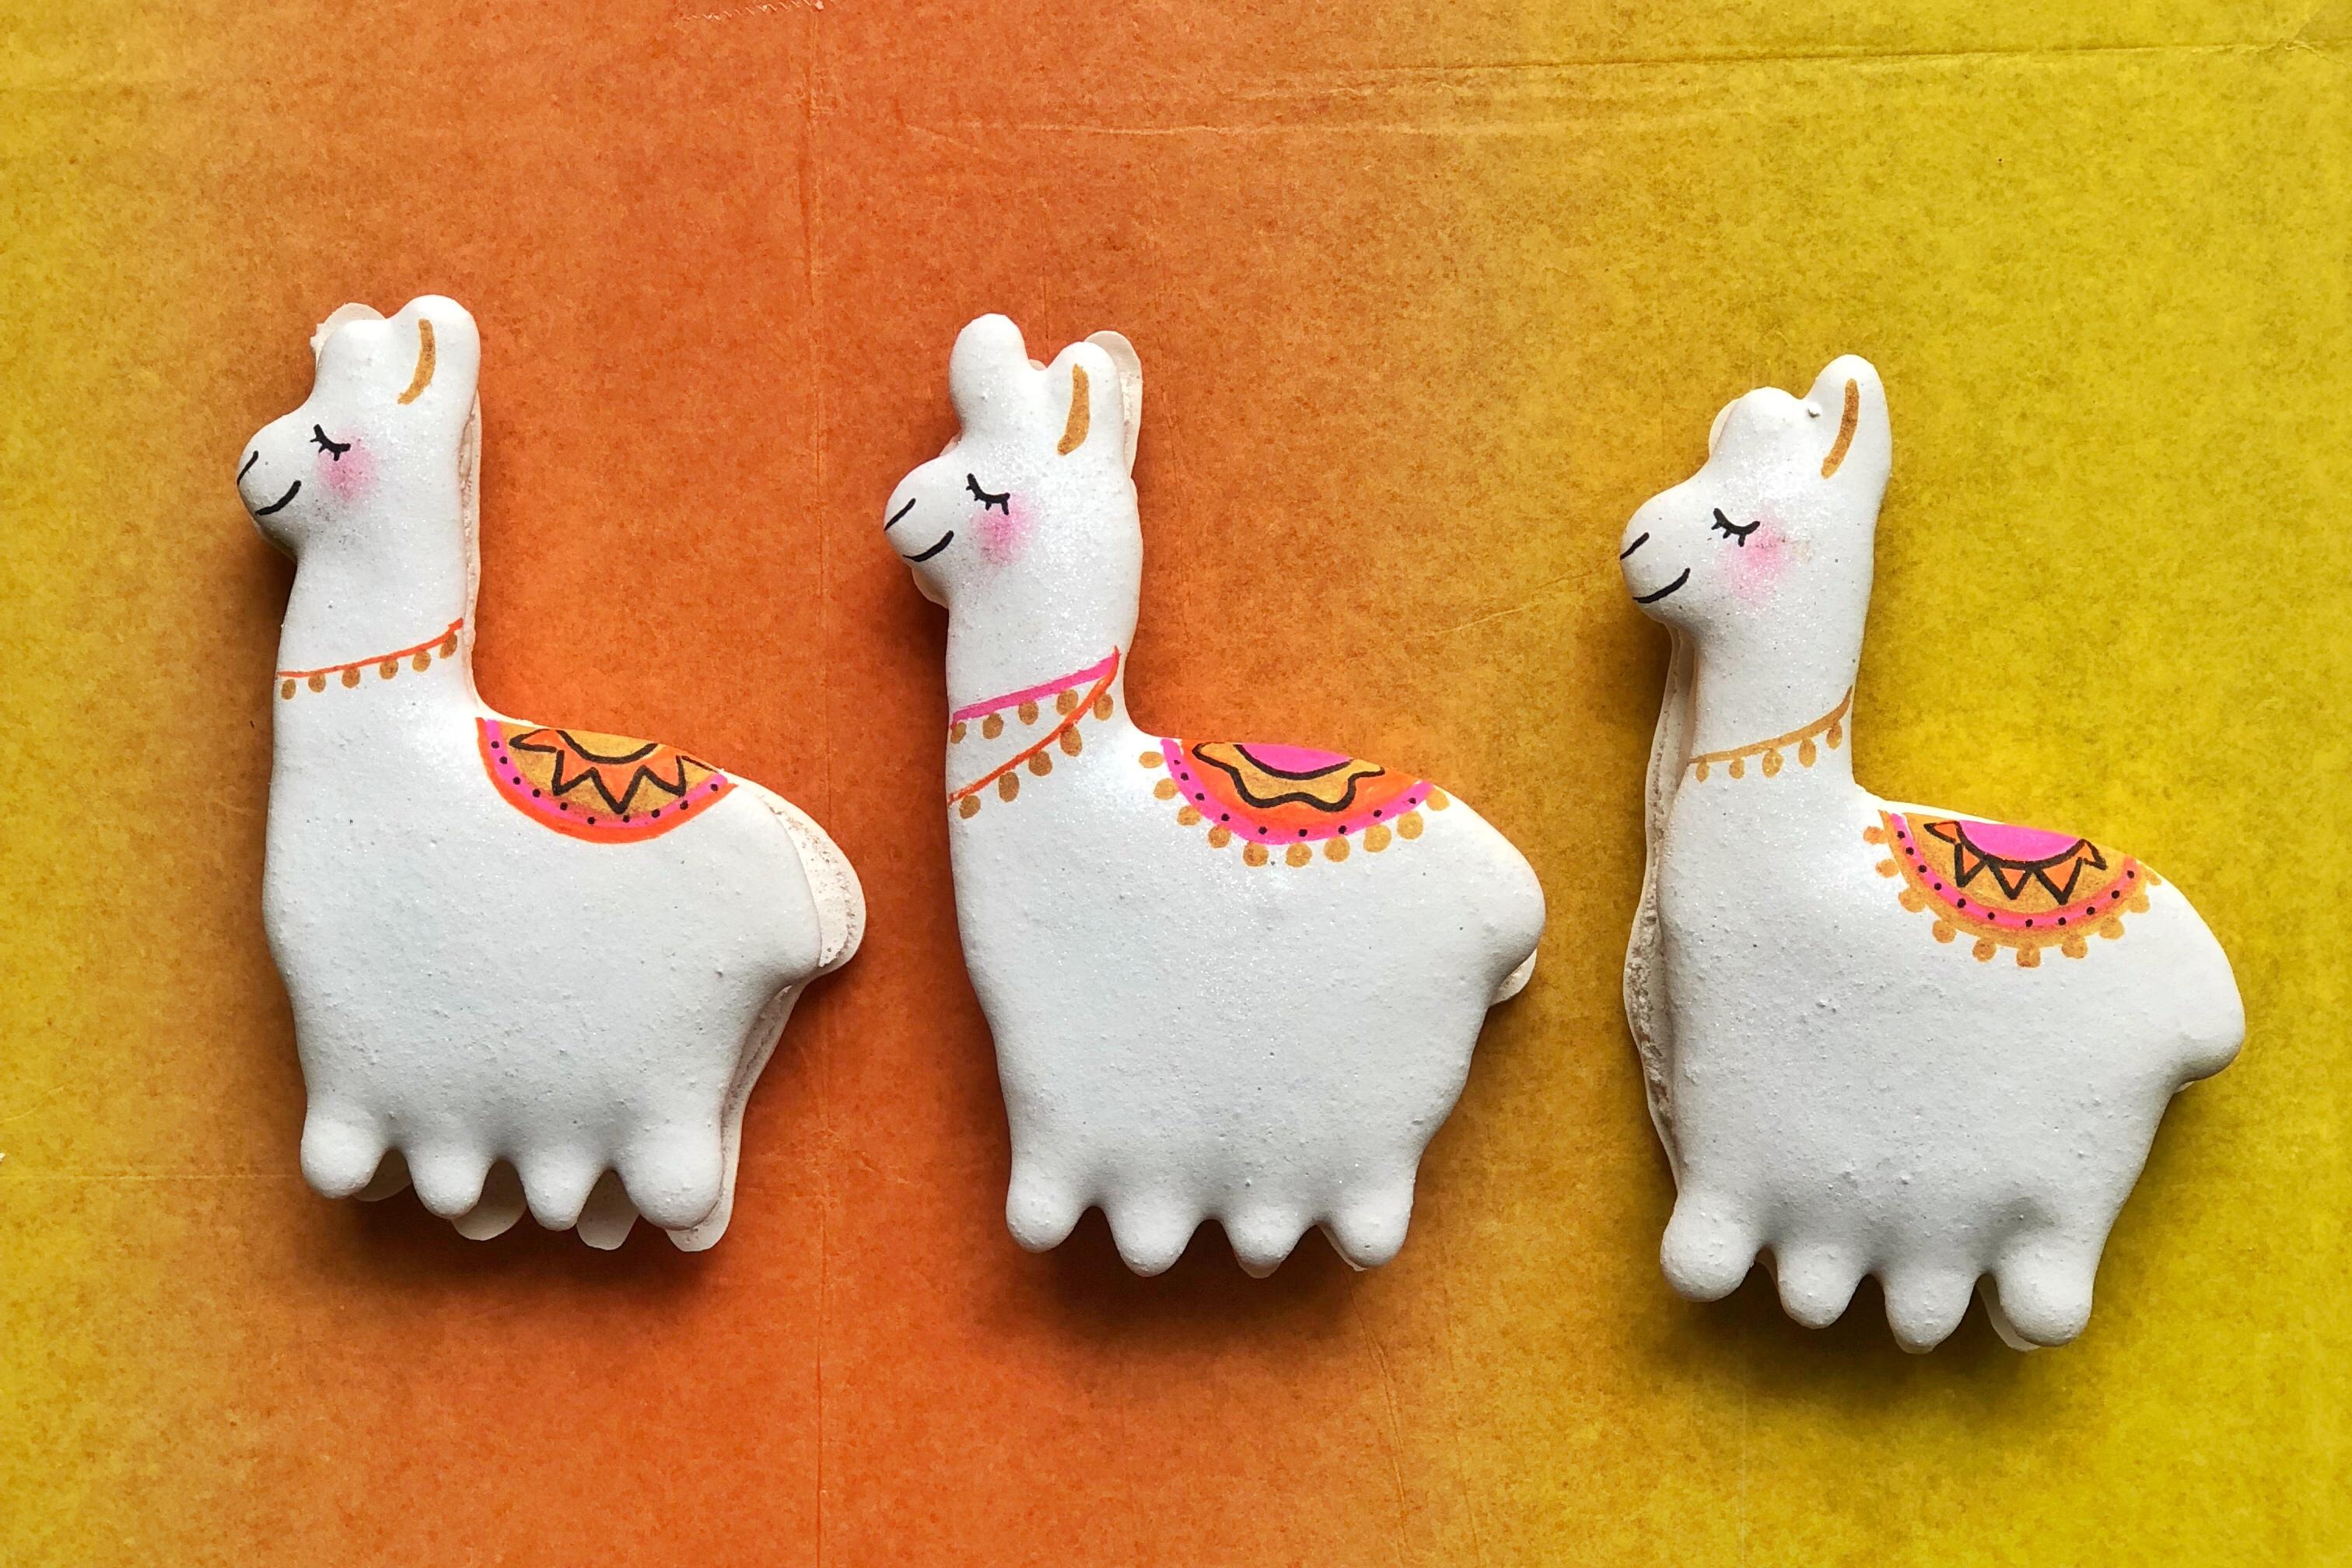 Colorful Llama Macarons